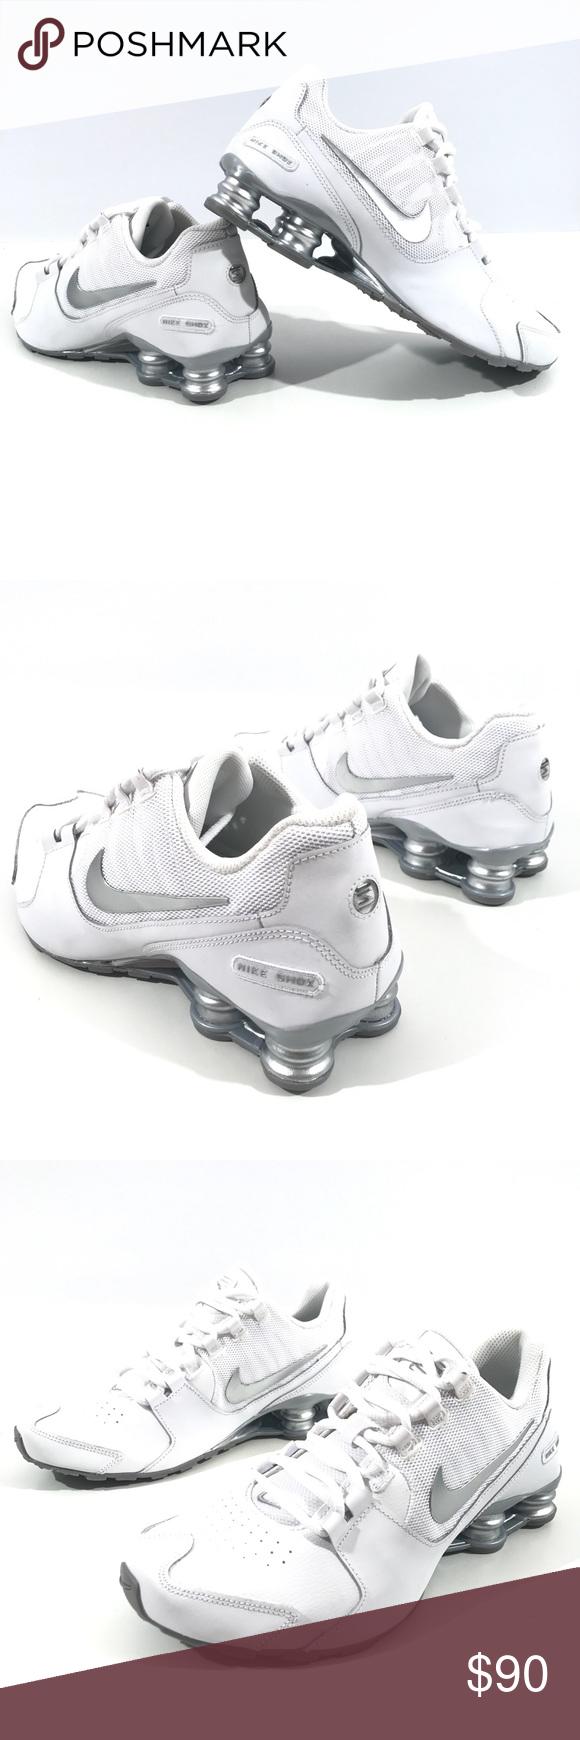 NEW NIKE SHOX AVENUE GS Running shoes NEW NIKE SHOX AVENUE GS Running KIDS  YOUTH 848112